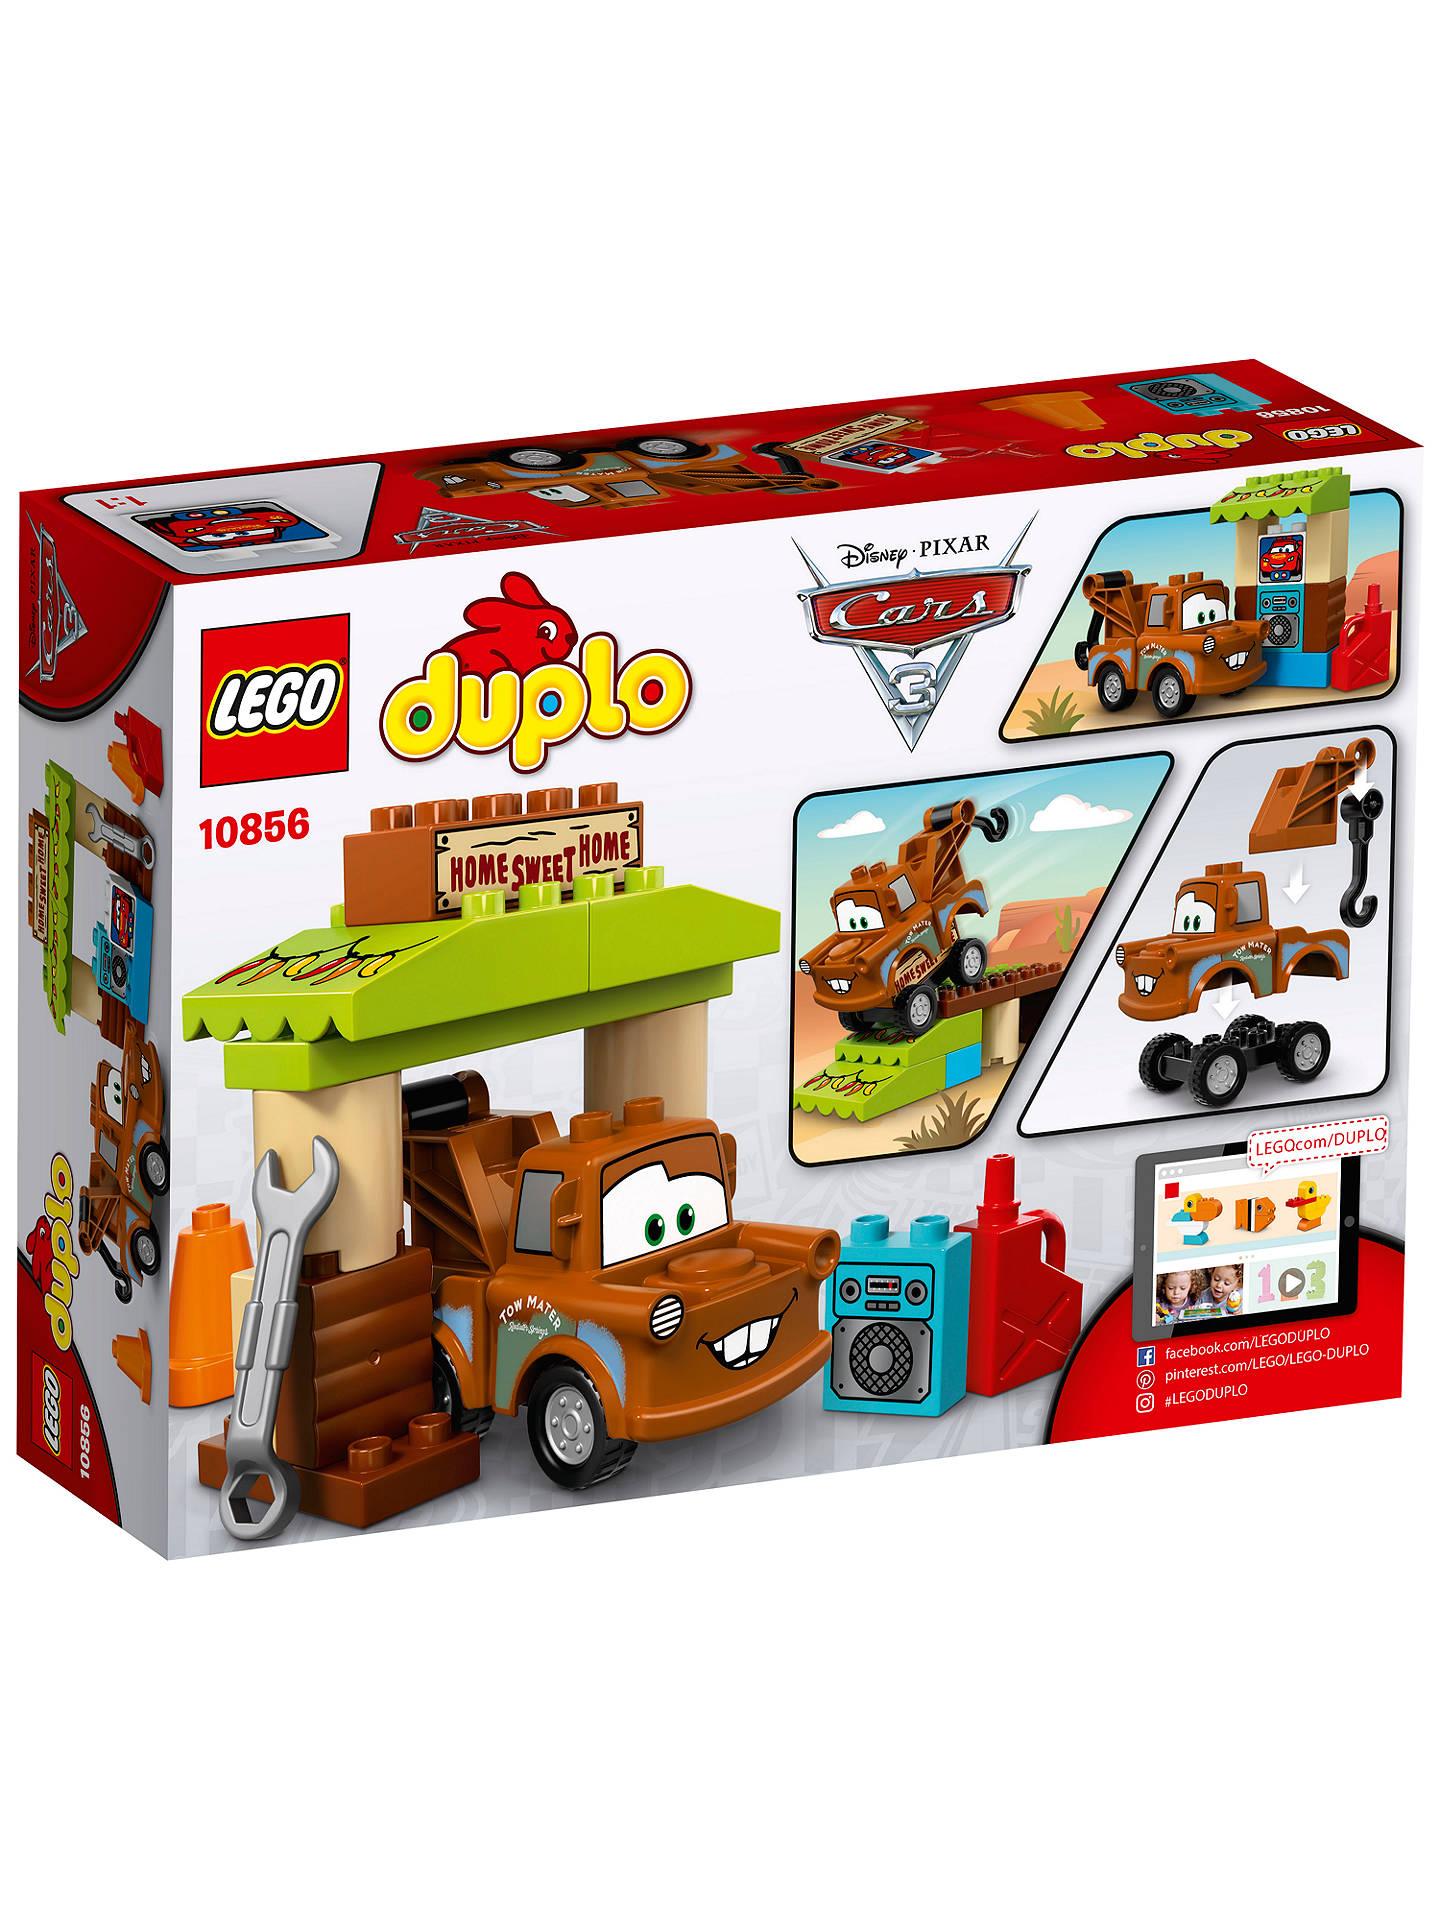 Lego Duplo Disney Pixar Cars 3 10856 Maters Shed At John Lewis